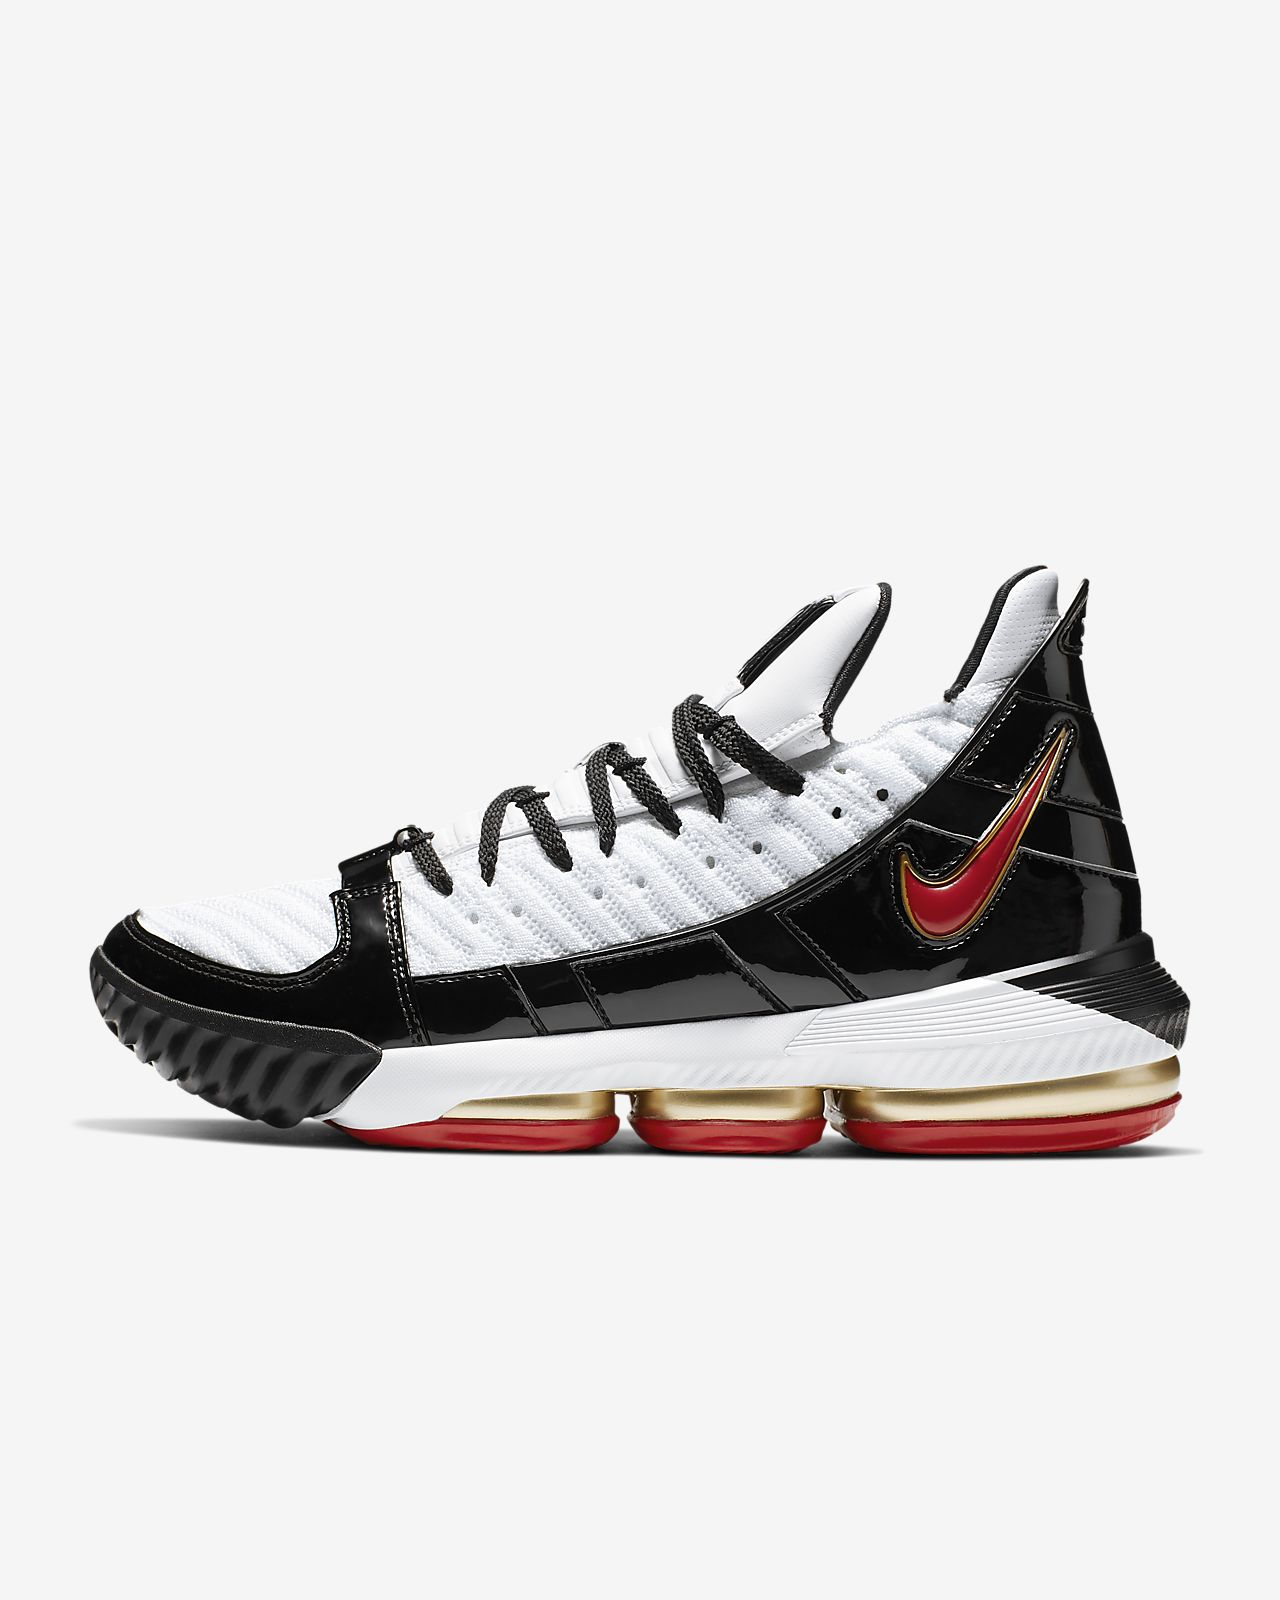 a374c29b1bf Low Resolution LeBron 16 SB Shoe LeBron 16 SB Shoe